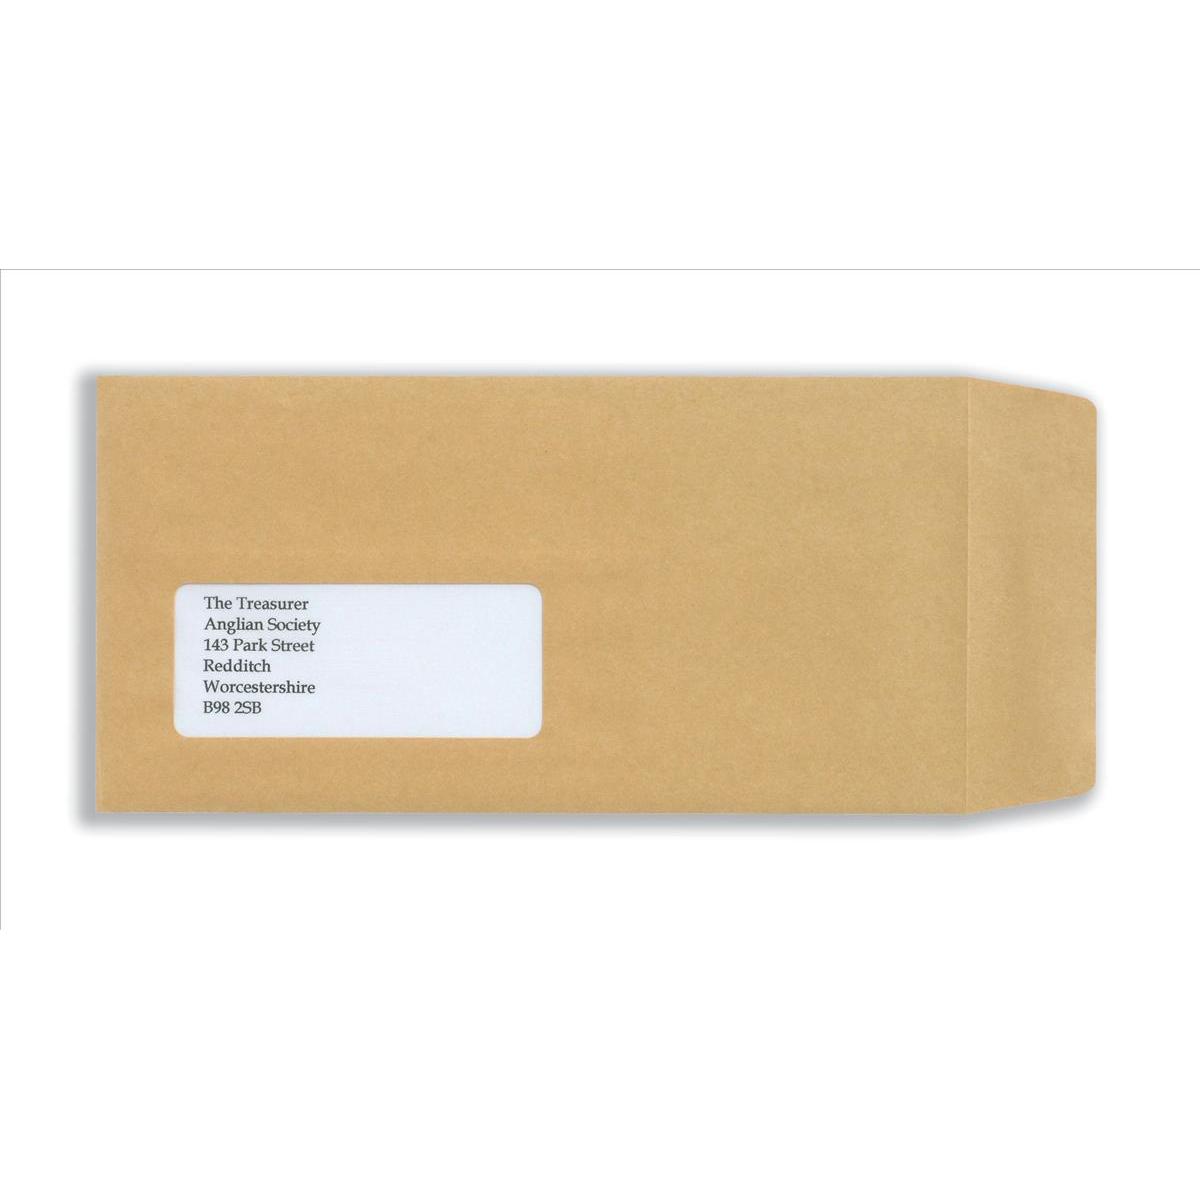 New Guardian Envelopes Pocket Self Seal Window 80gsm DL 220x110mm Manilla Ref D25311 Pack 1000